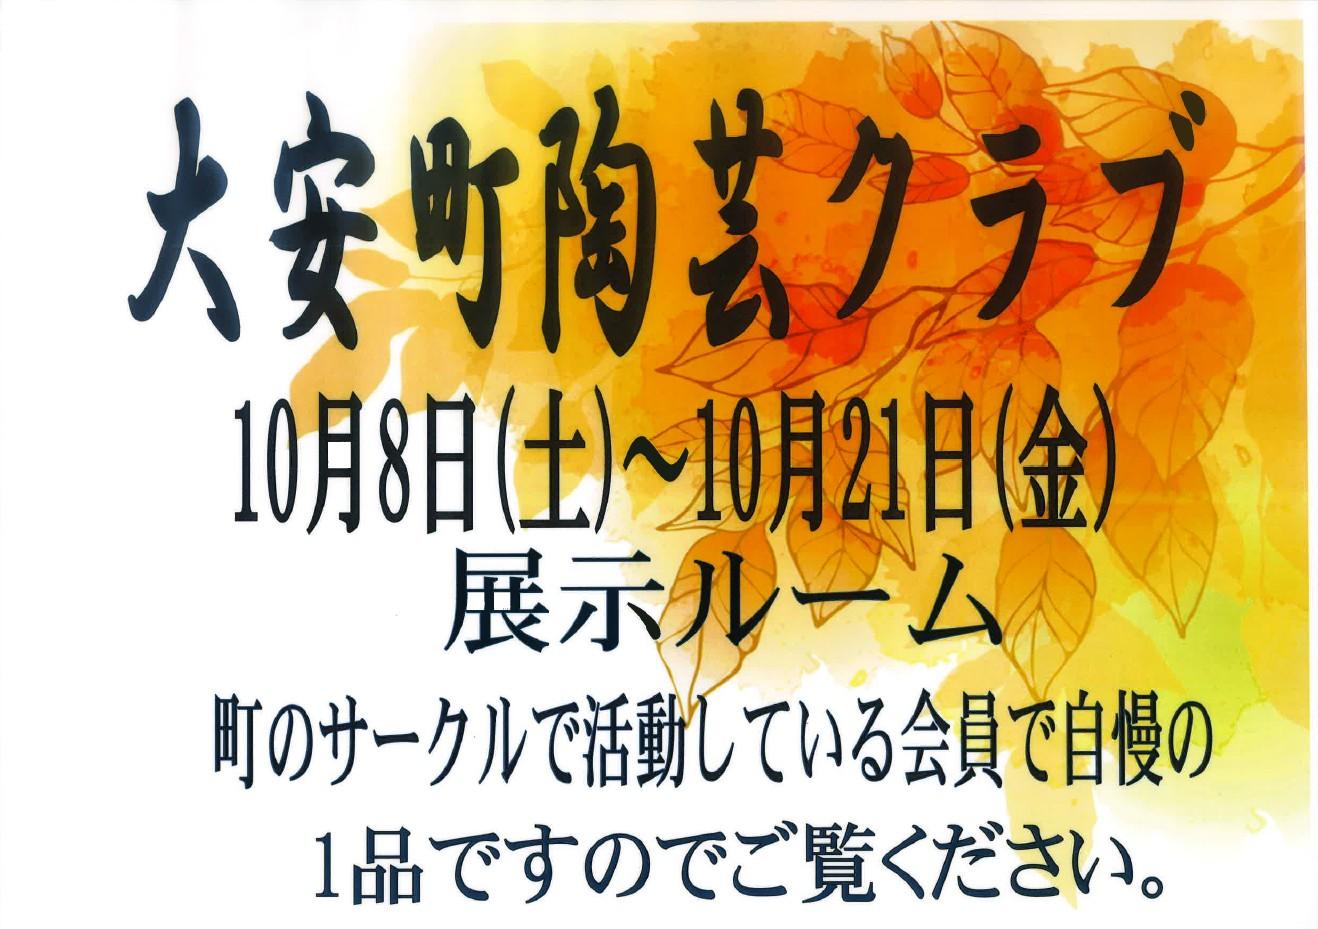 http://www.ajisainosato.com/info/images/2016y10m01d_152721020.jpg